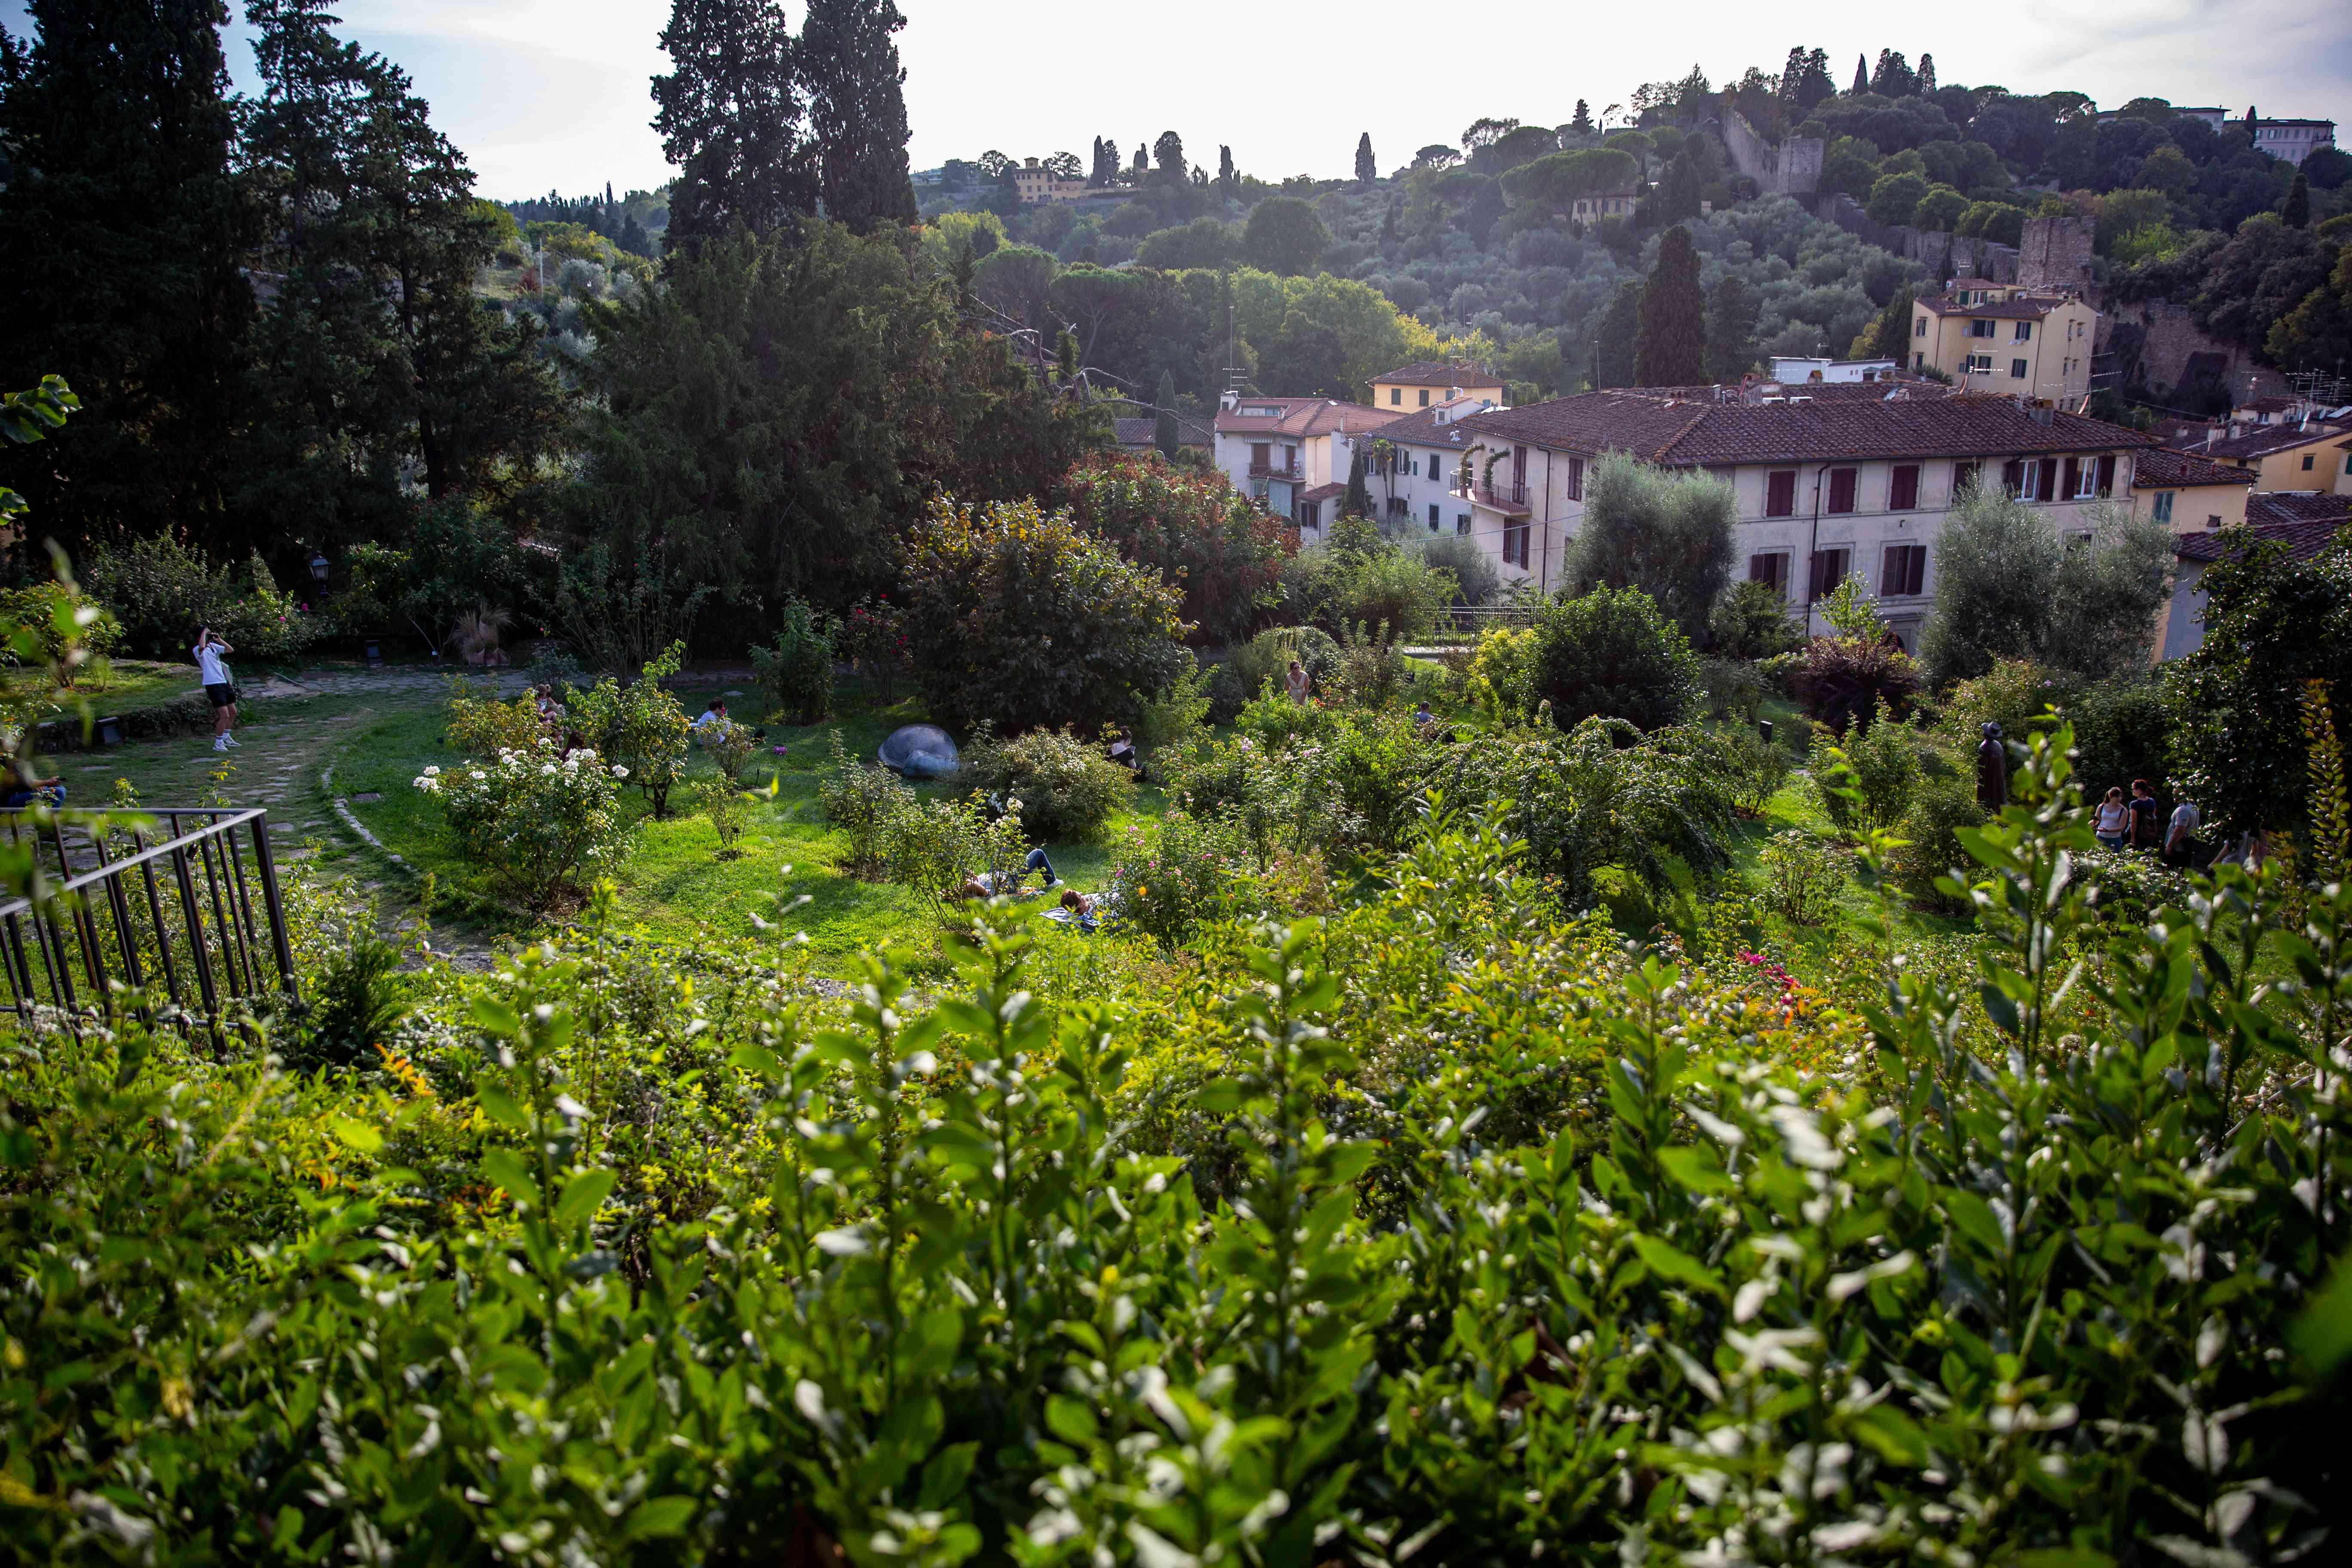 Giardino delle Rose in Florence